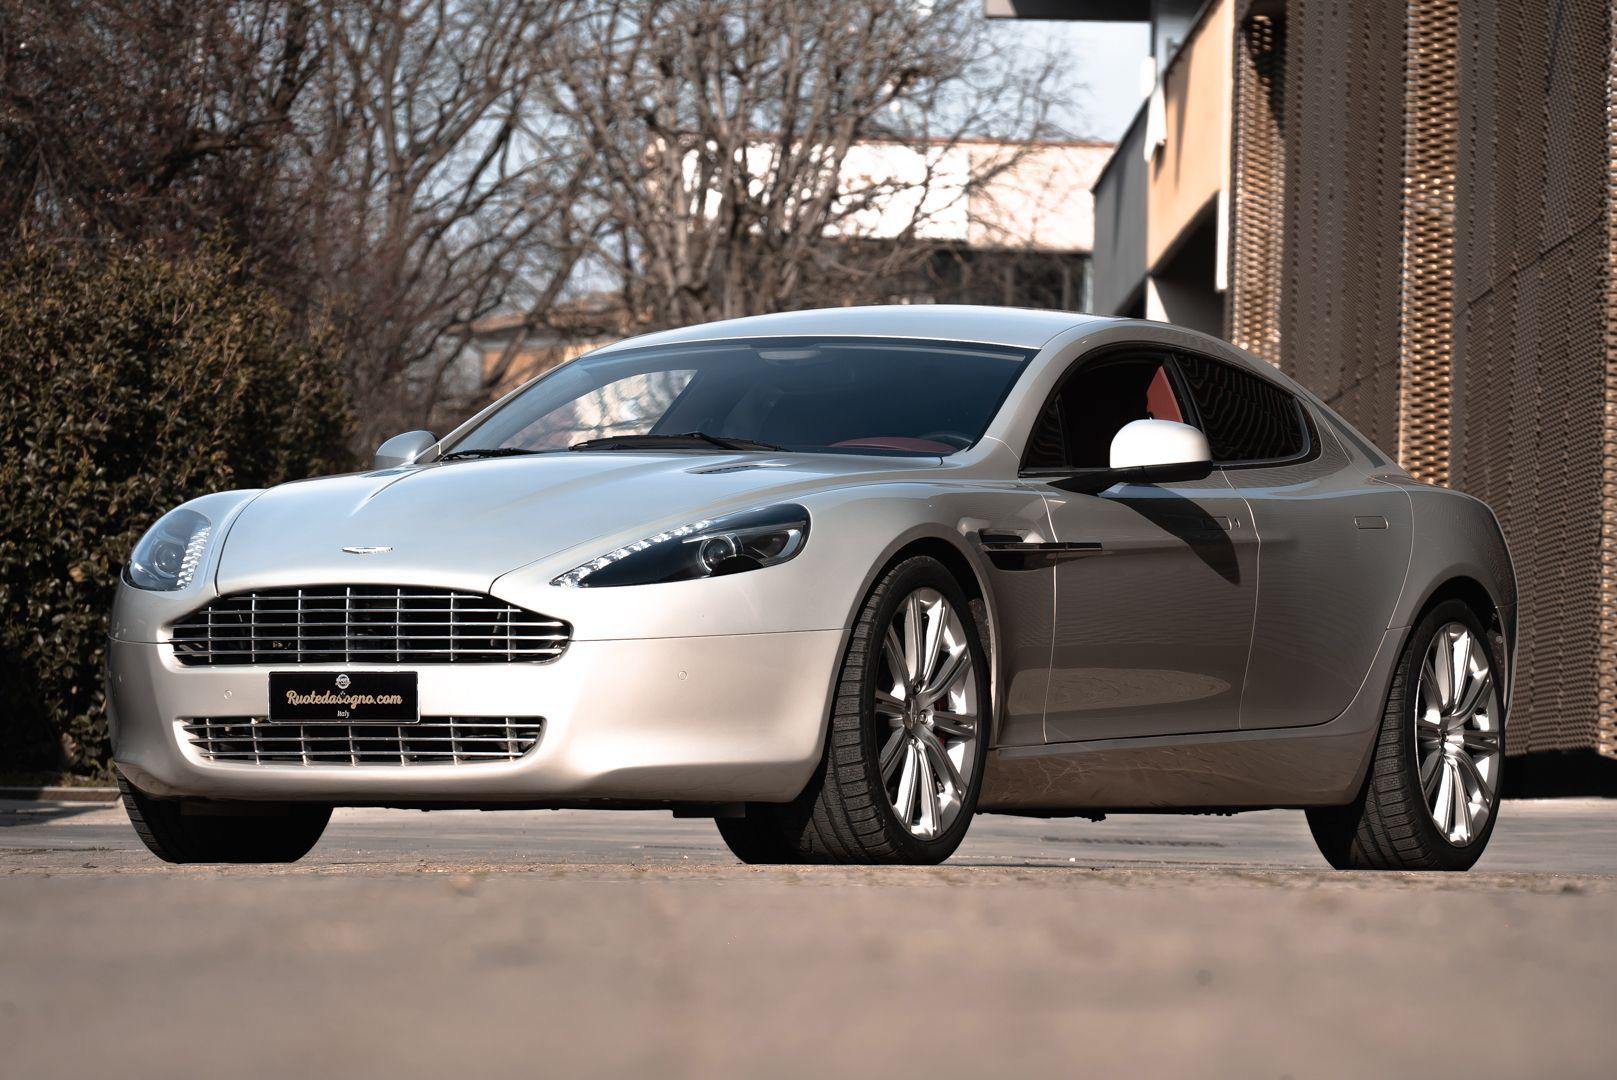 2010 Aston Martin Rapide 6.0 V12 62610